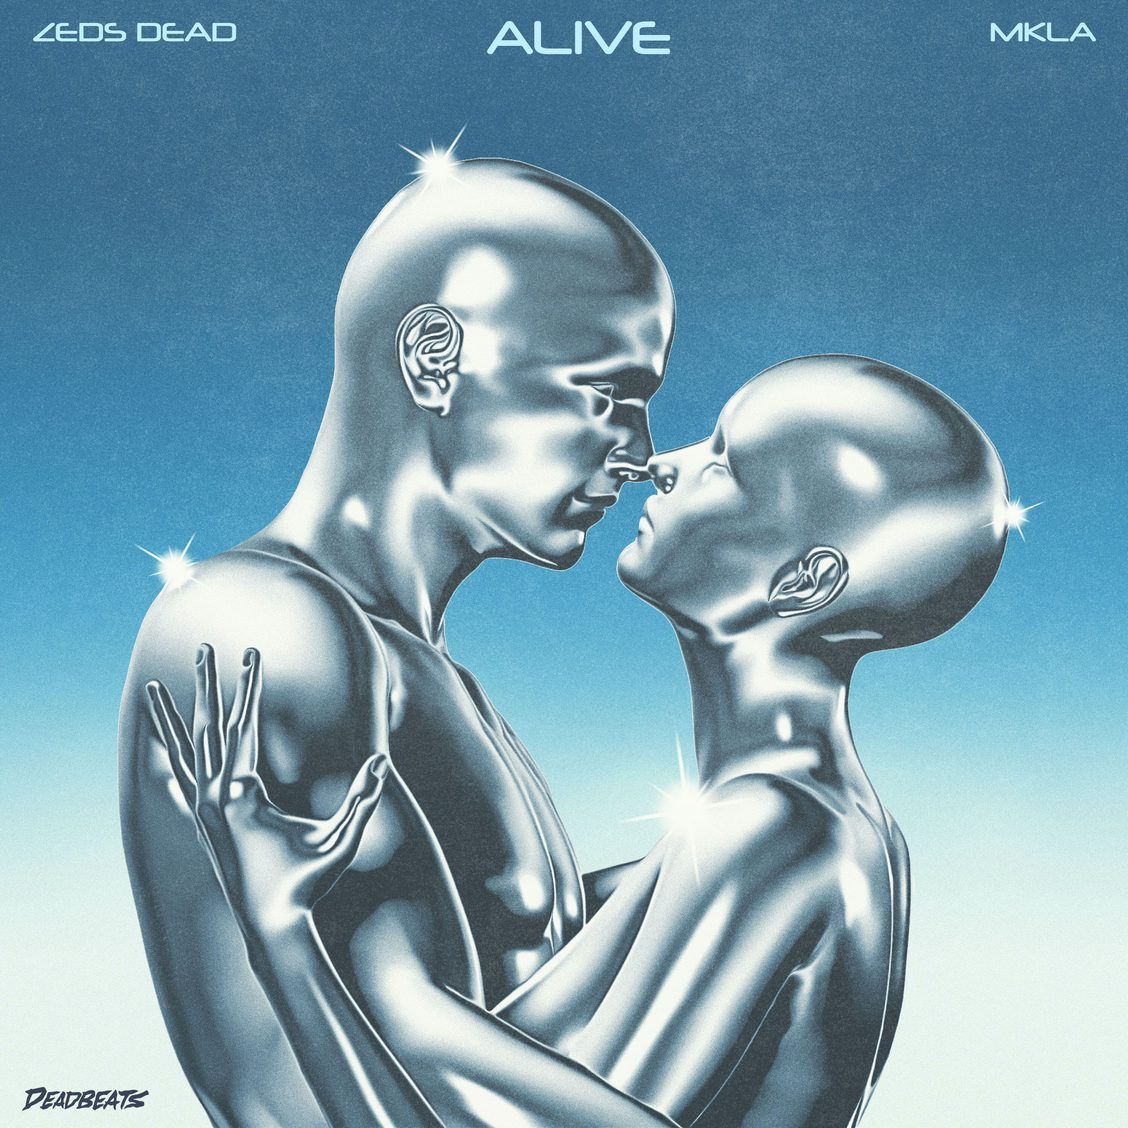 Alive Zeds Dead